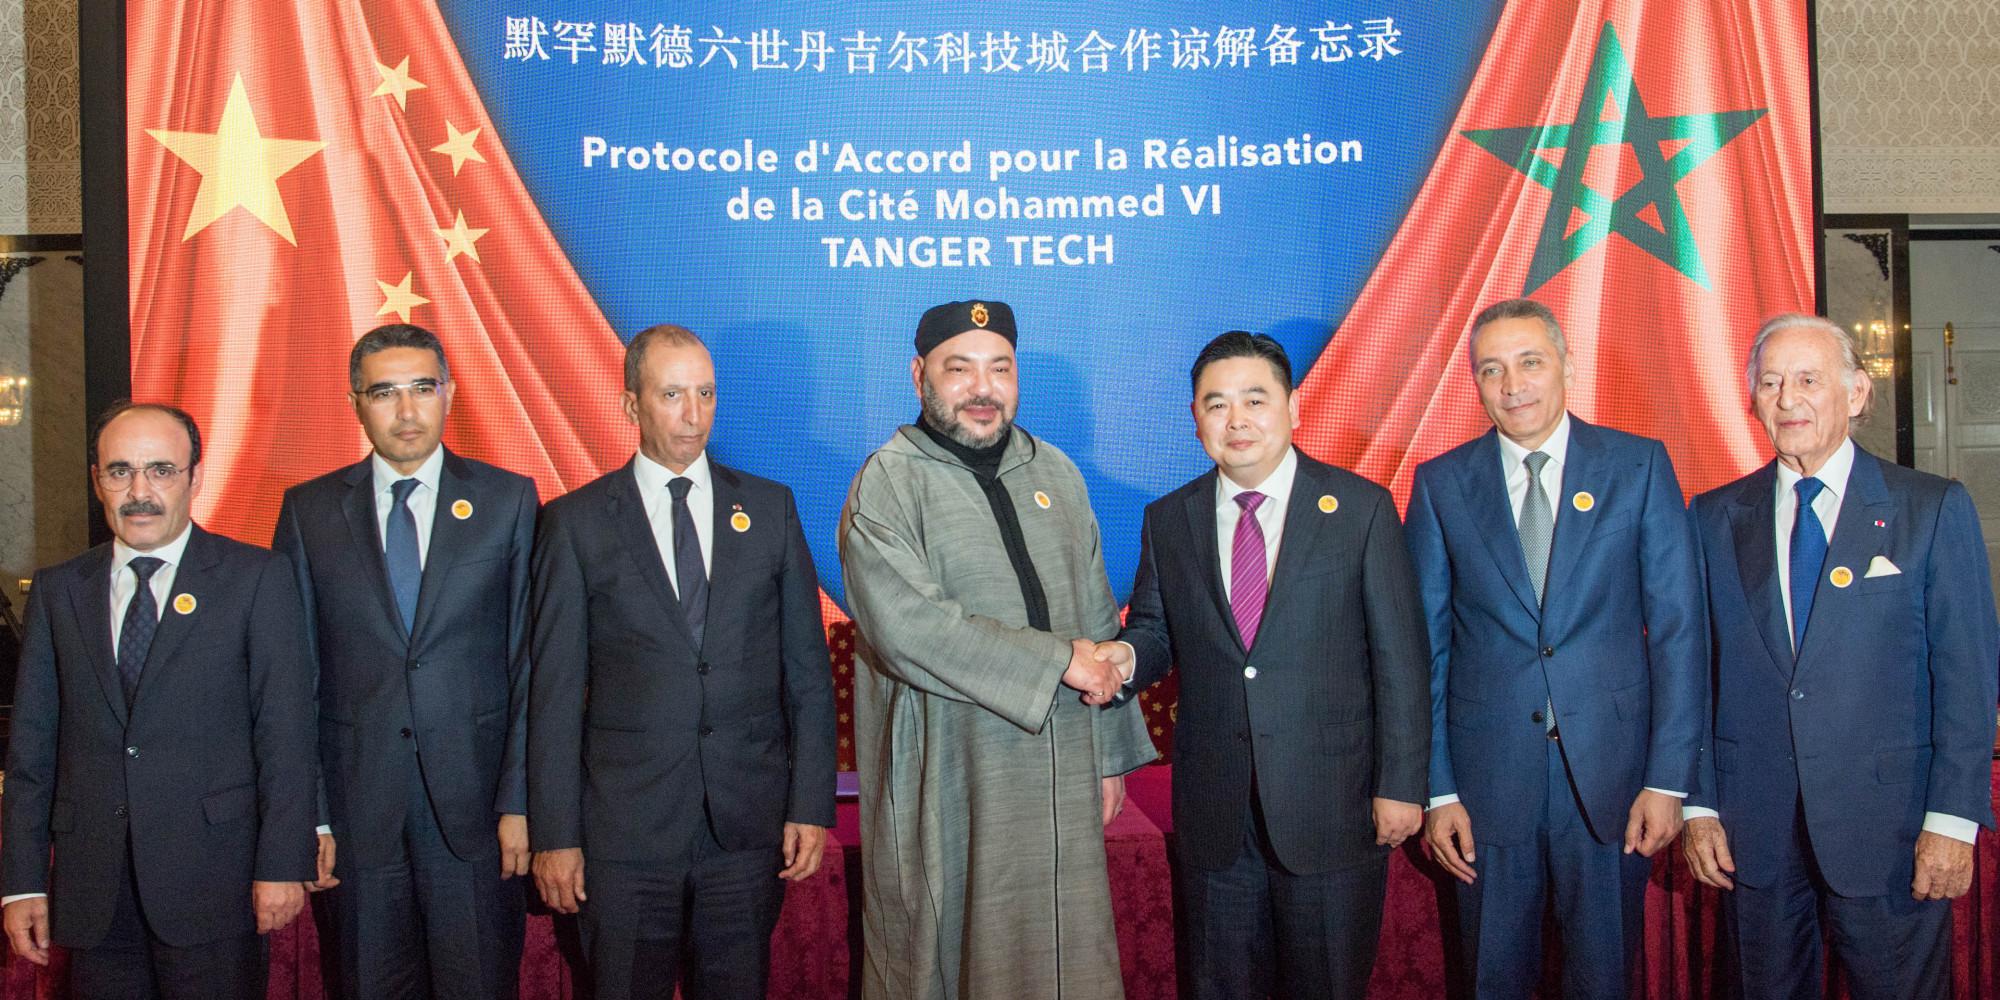 Tanger accueille un investissement colossal de 10 milliards de dollars